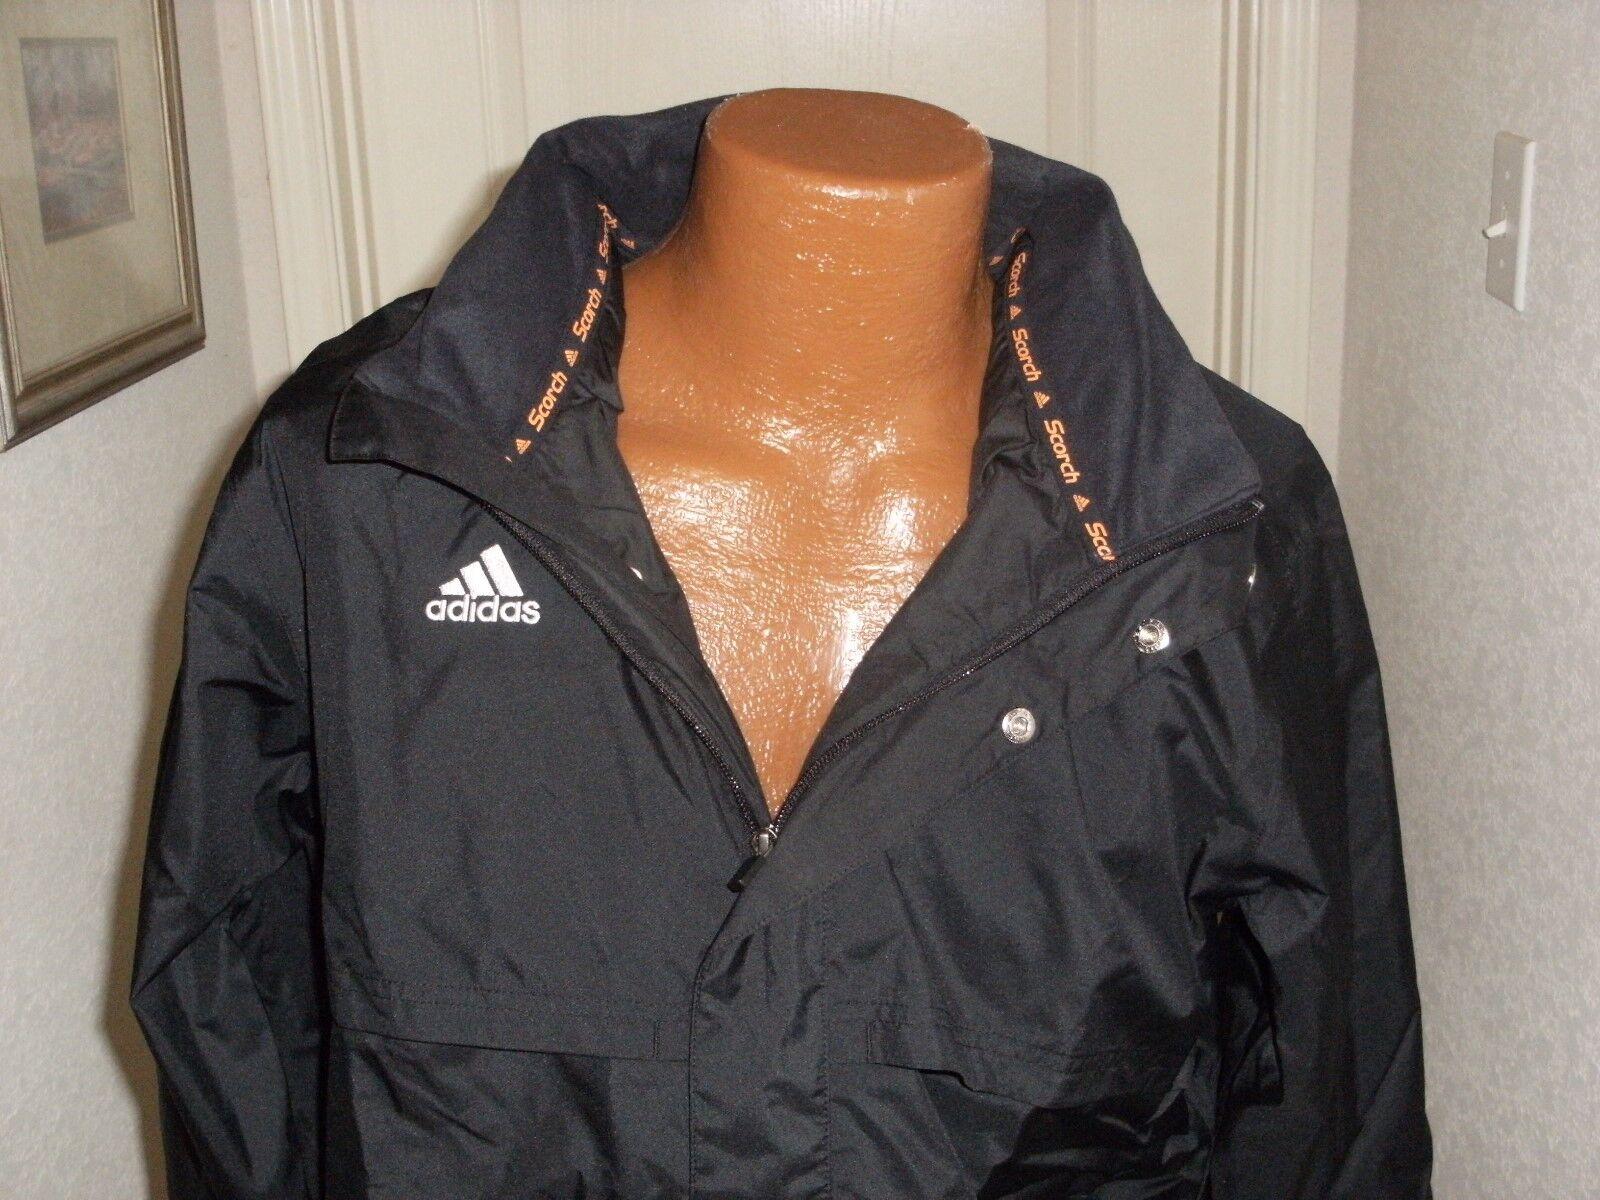 Adidas Uomo Sc Stadium Shel Suit W/Hidaway Hood